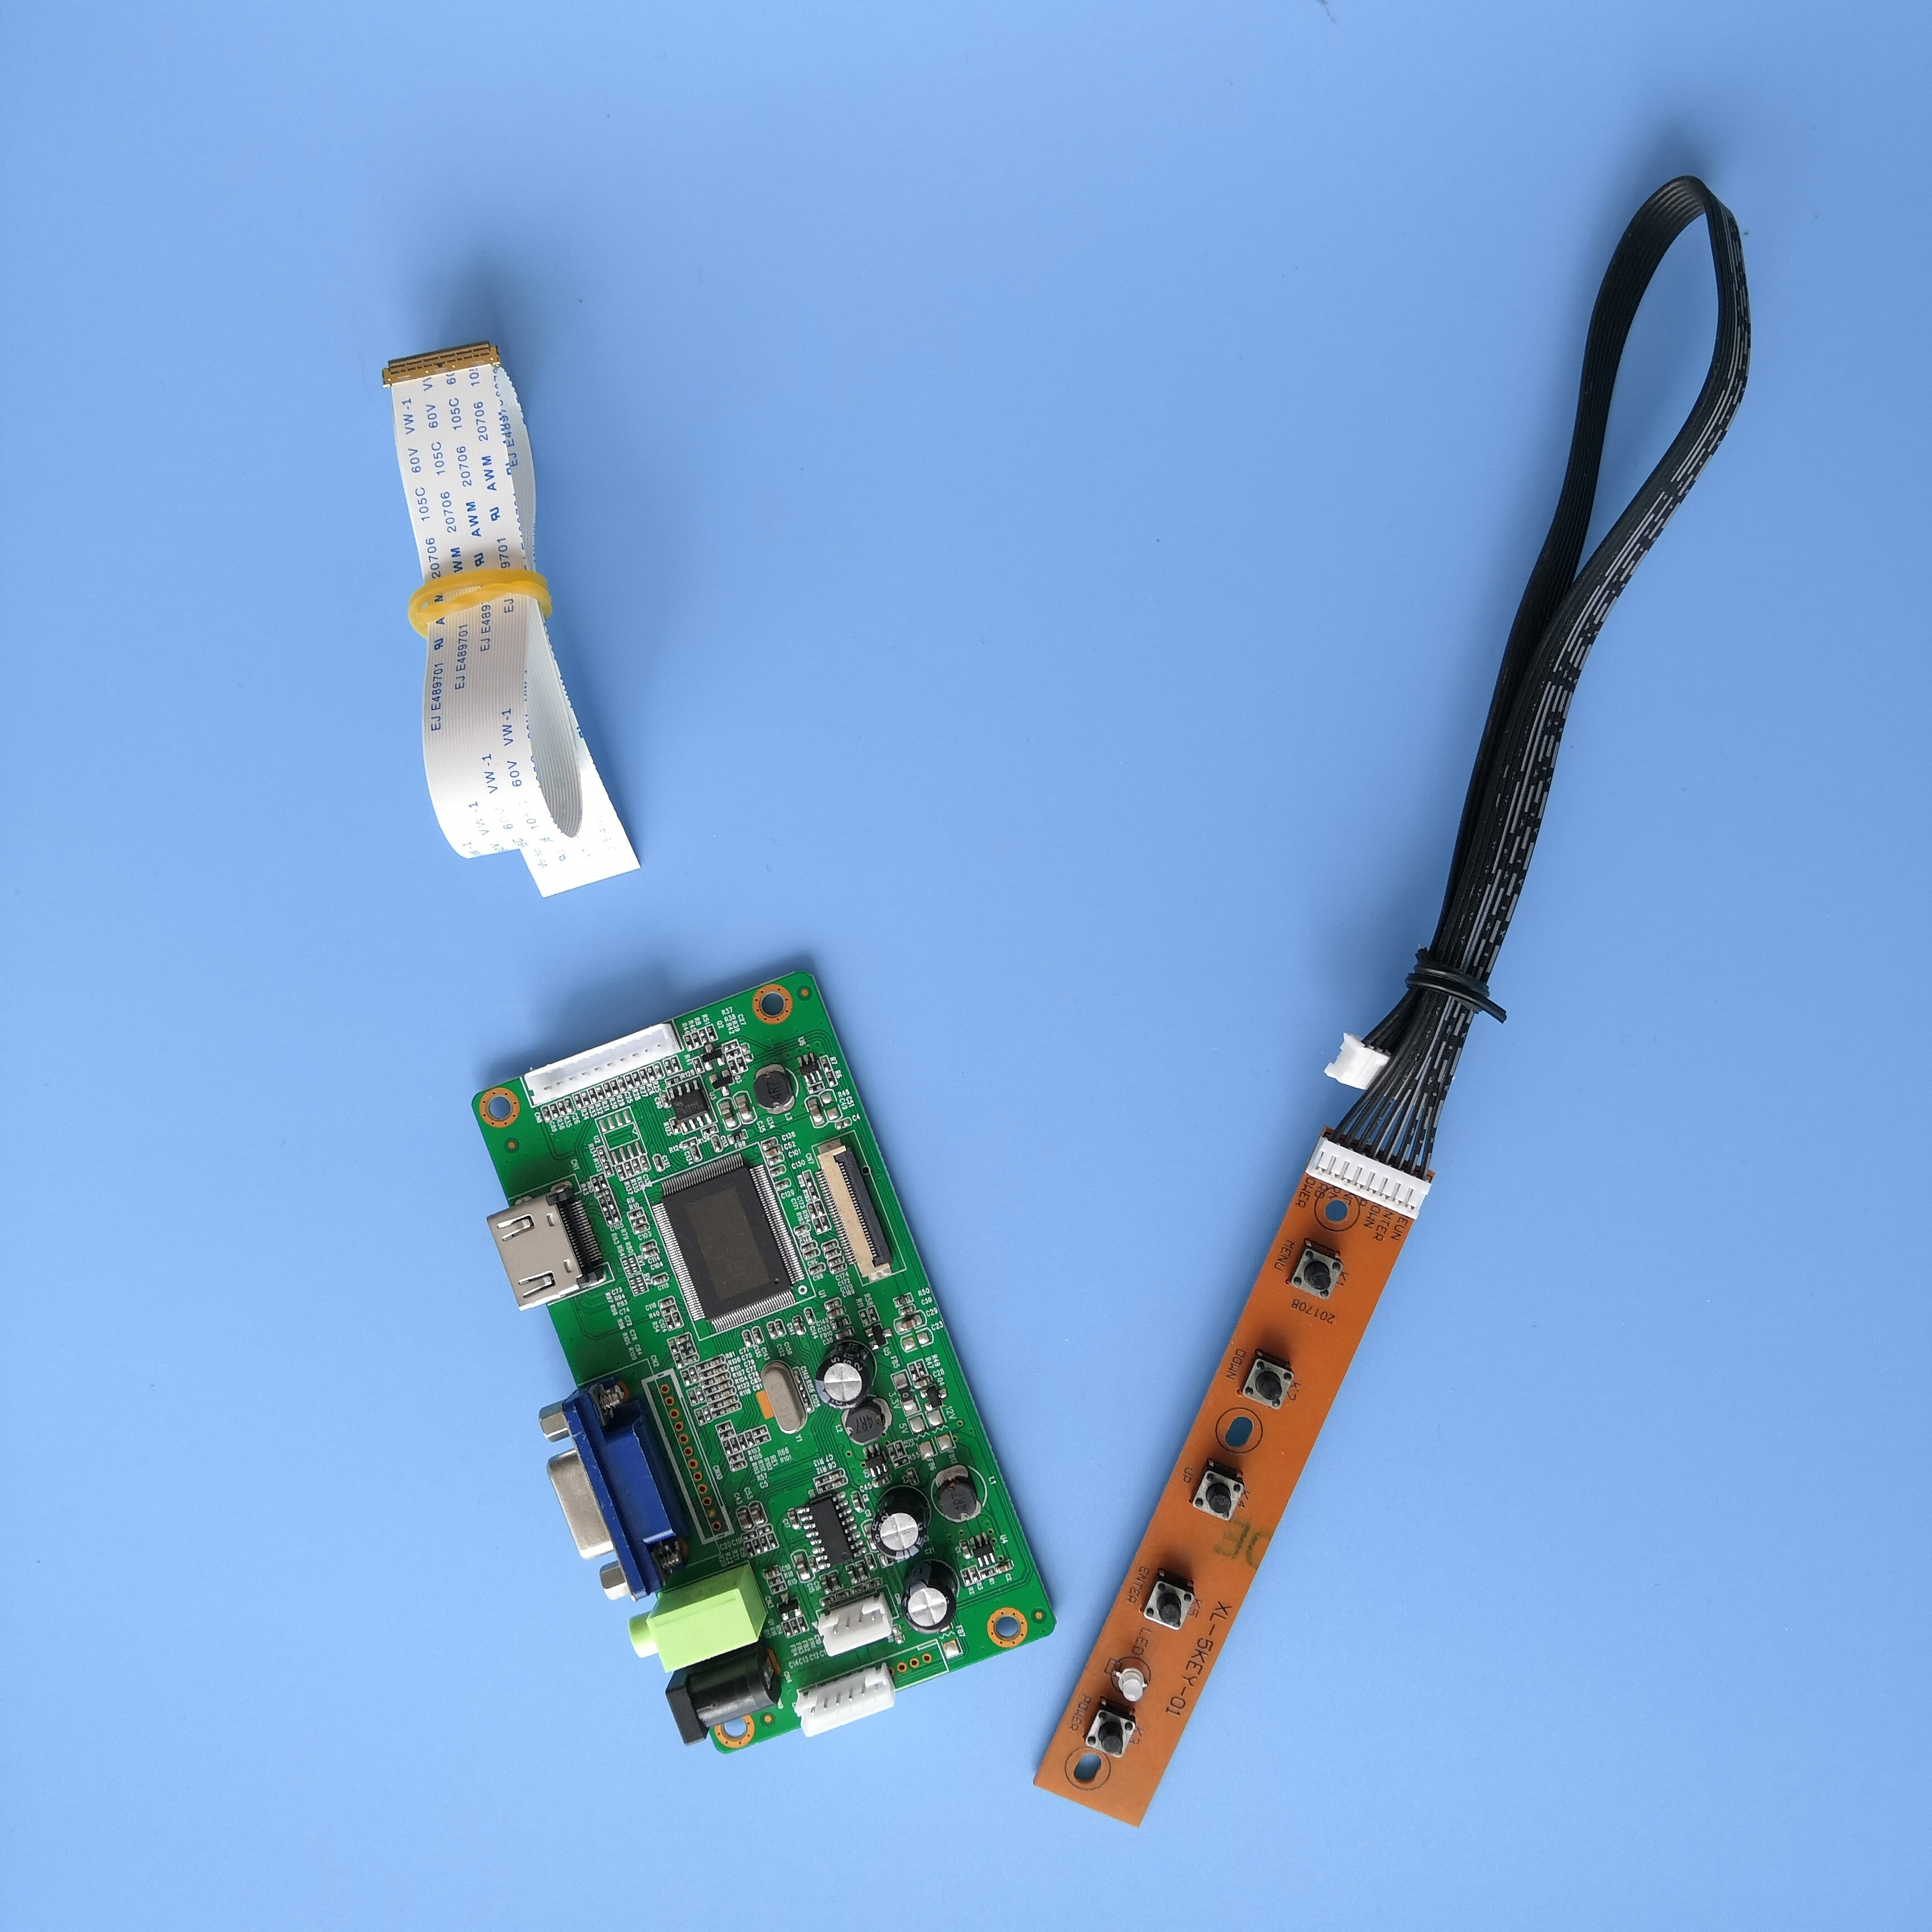 ل NV156FHM-N63 LCD لتقوم بها بنفسك رصد سائق عدة VGA 1920X1080 شاشة عرض 30Pin LED EDP EDP تحكم مجلس 15.6